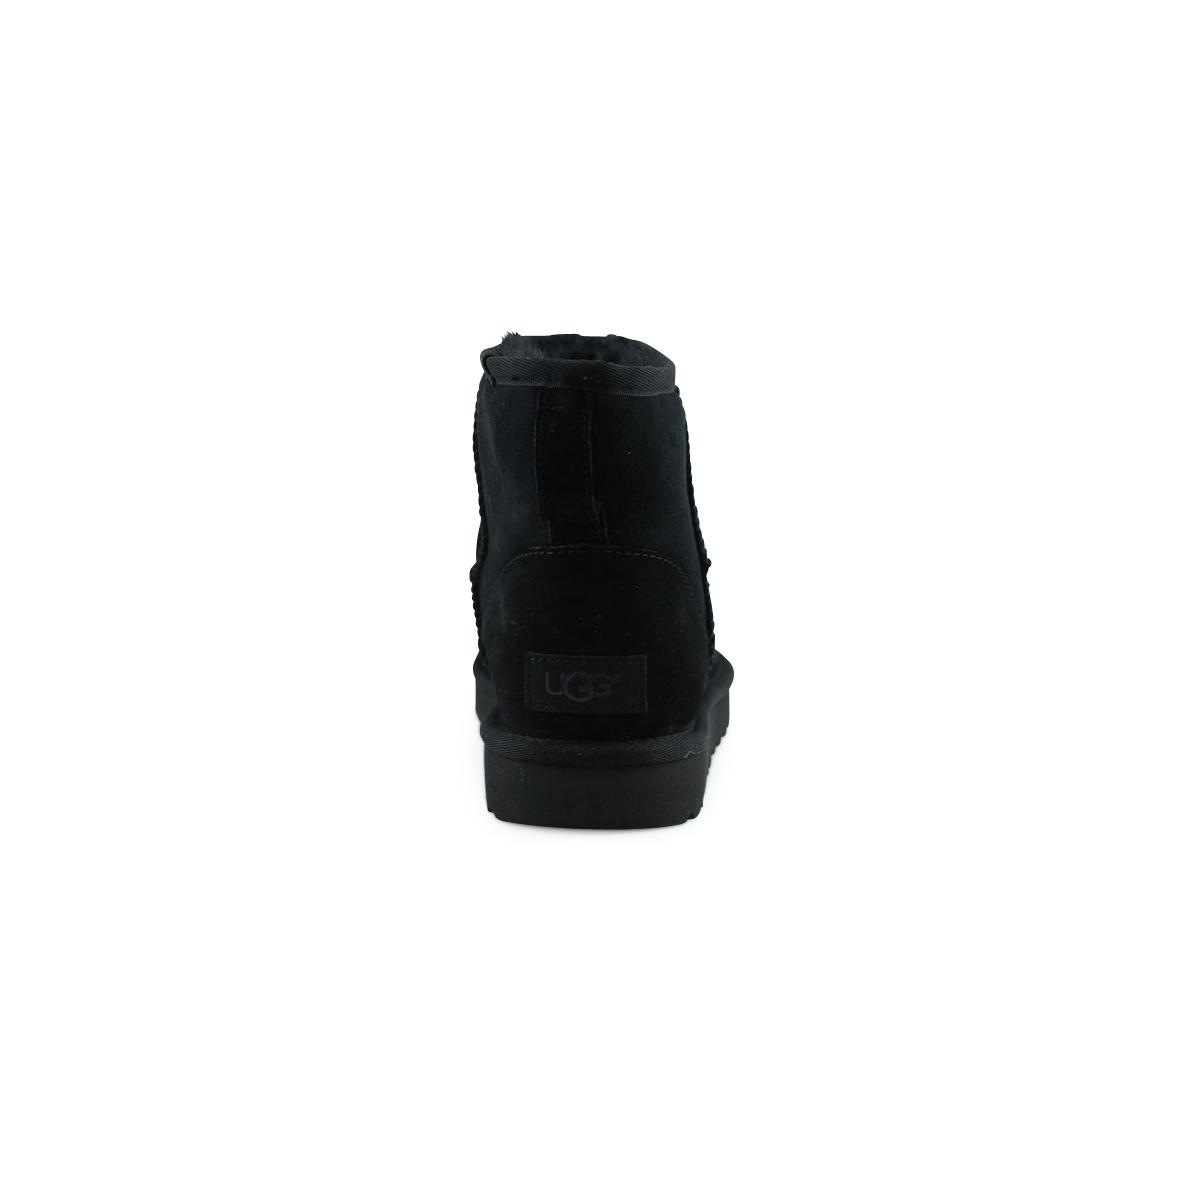 Ugg W Classic Mini 2 Noir 1016222blk